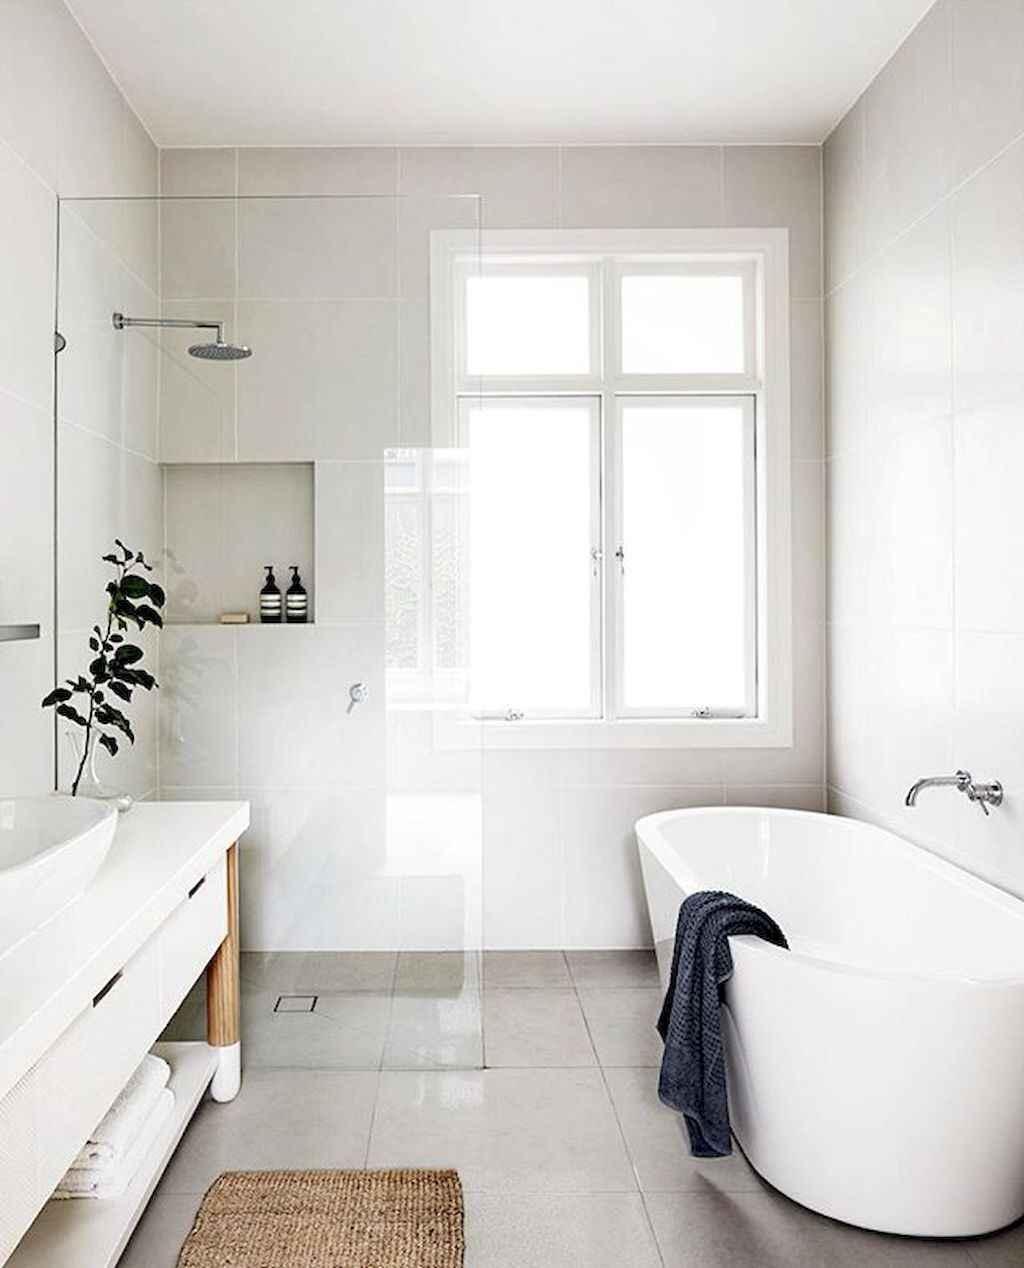 Amazing tiny house bathroom shower ideas (64) - HomeSpecially